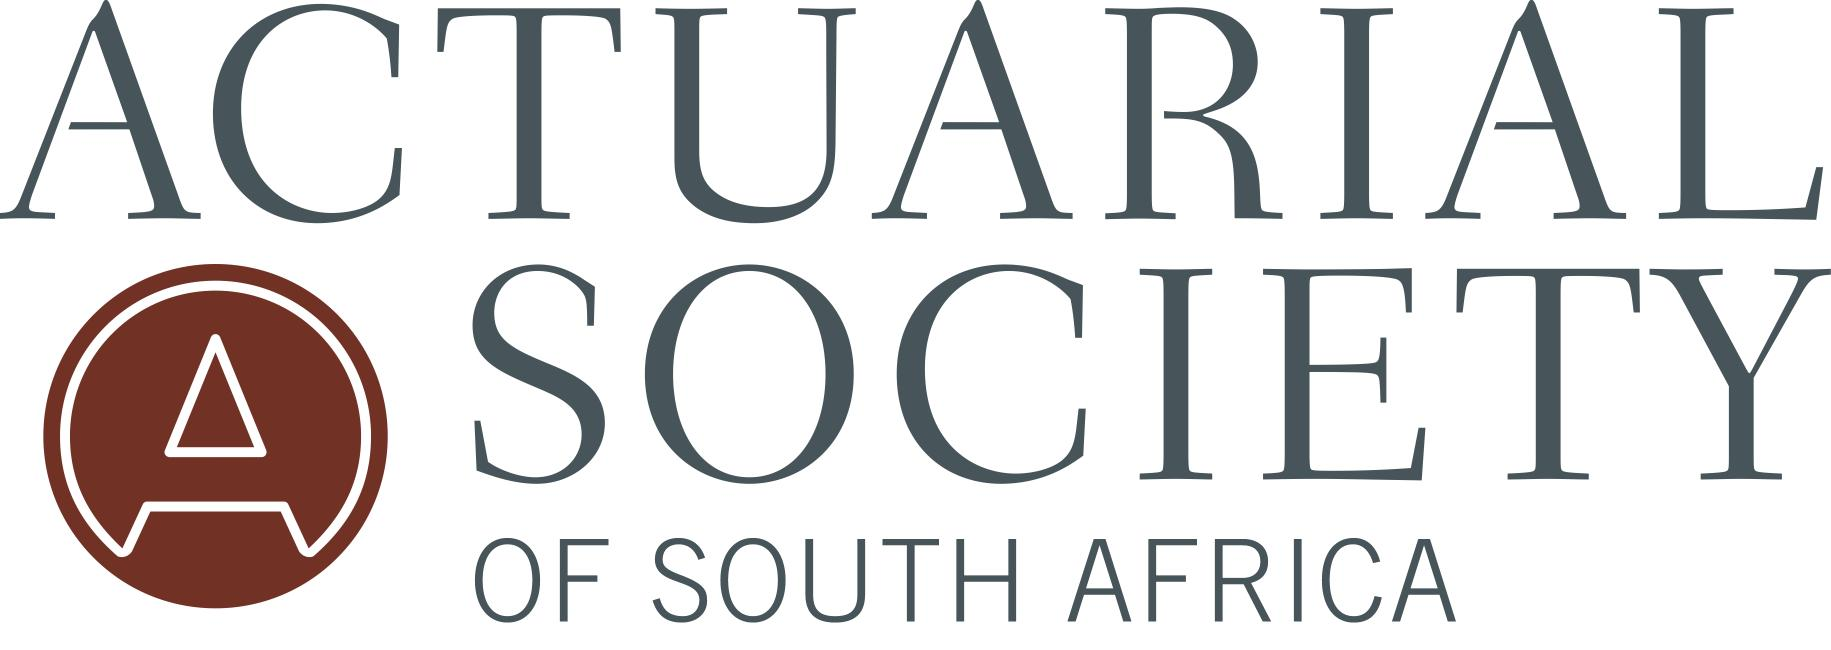 Actuarial society logo.jpg